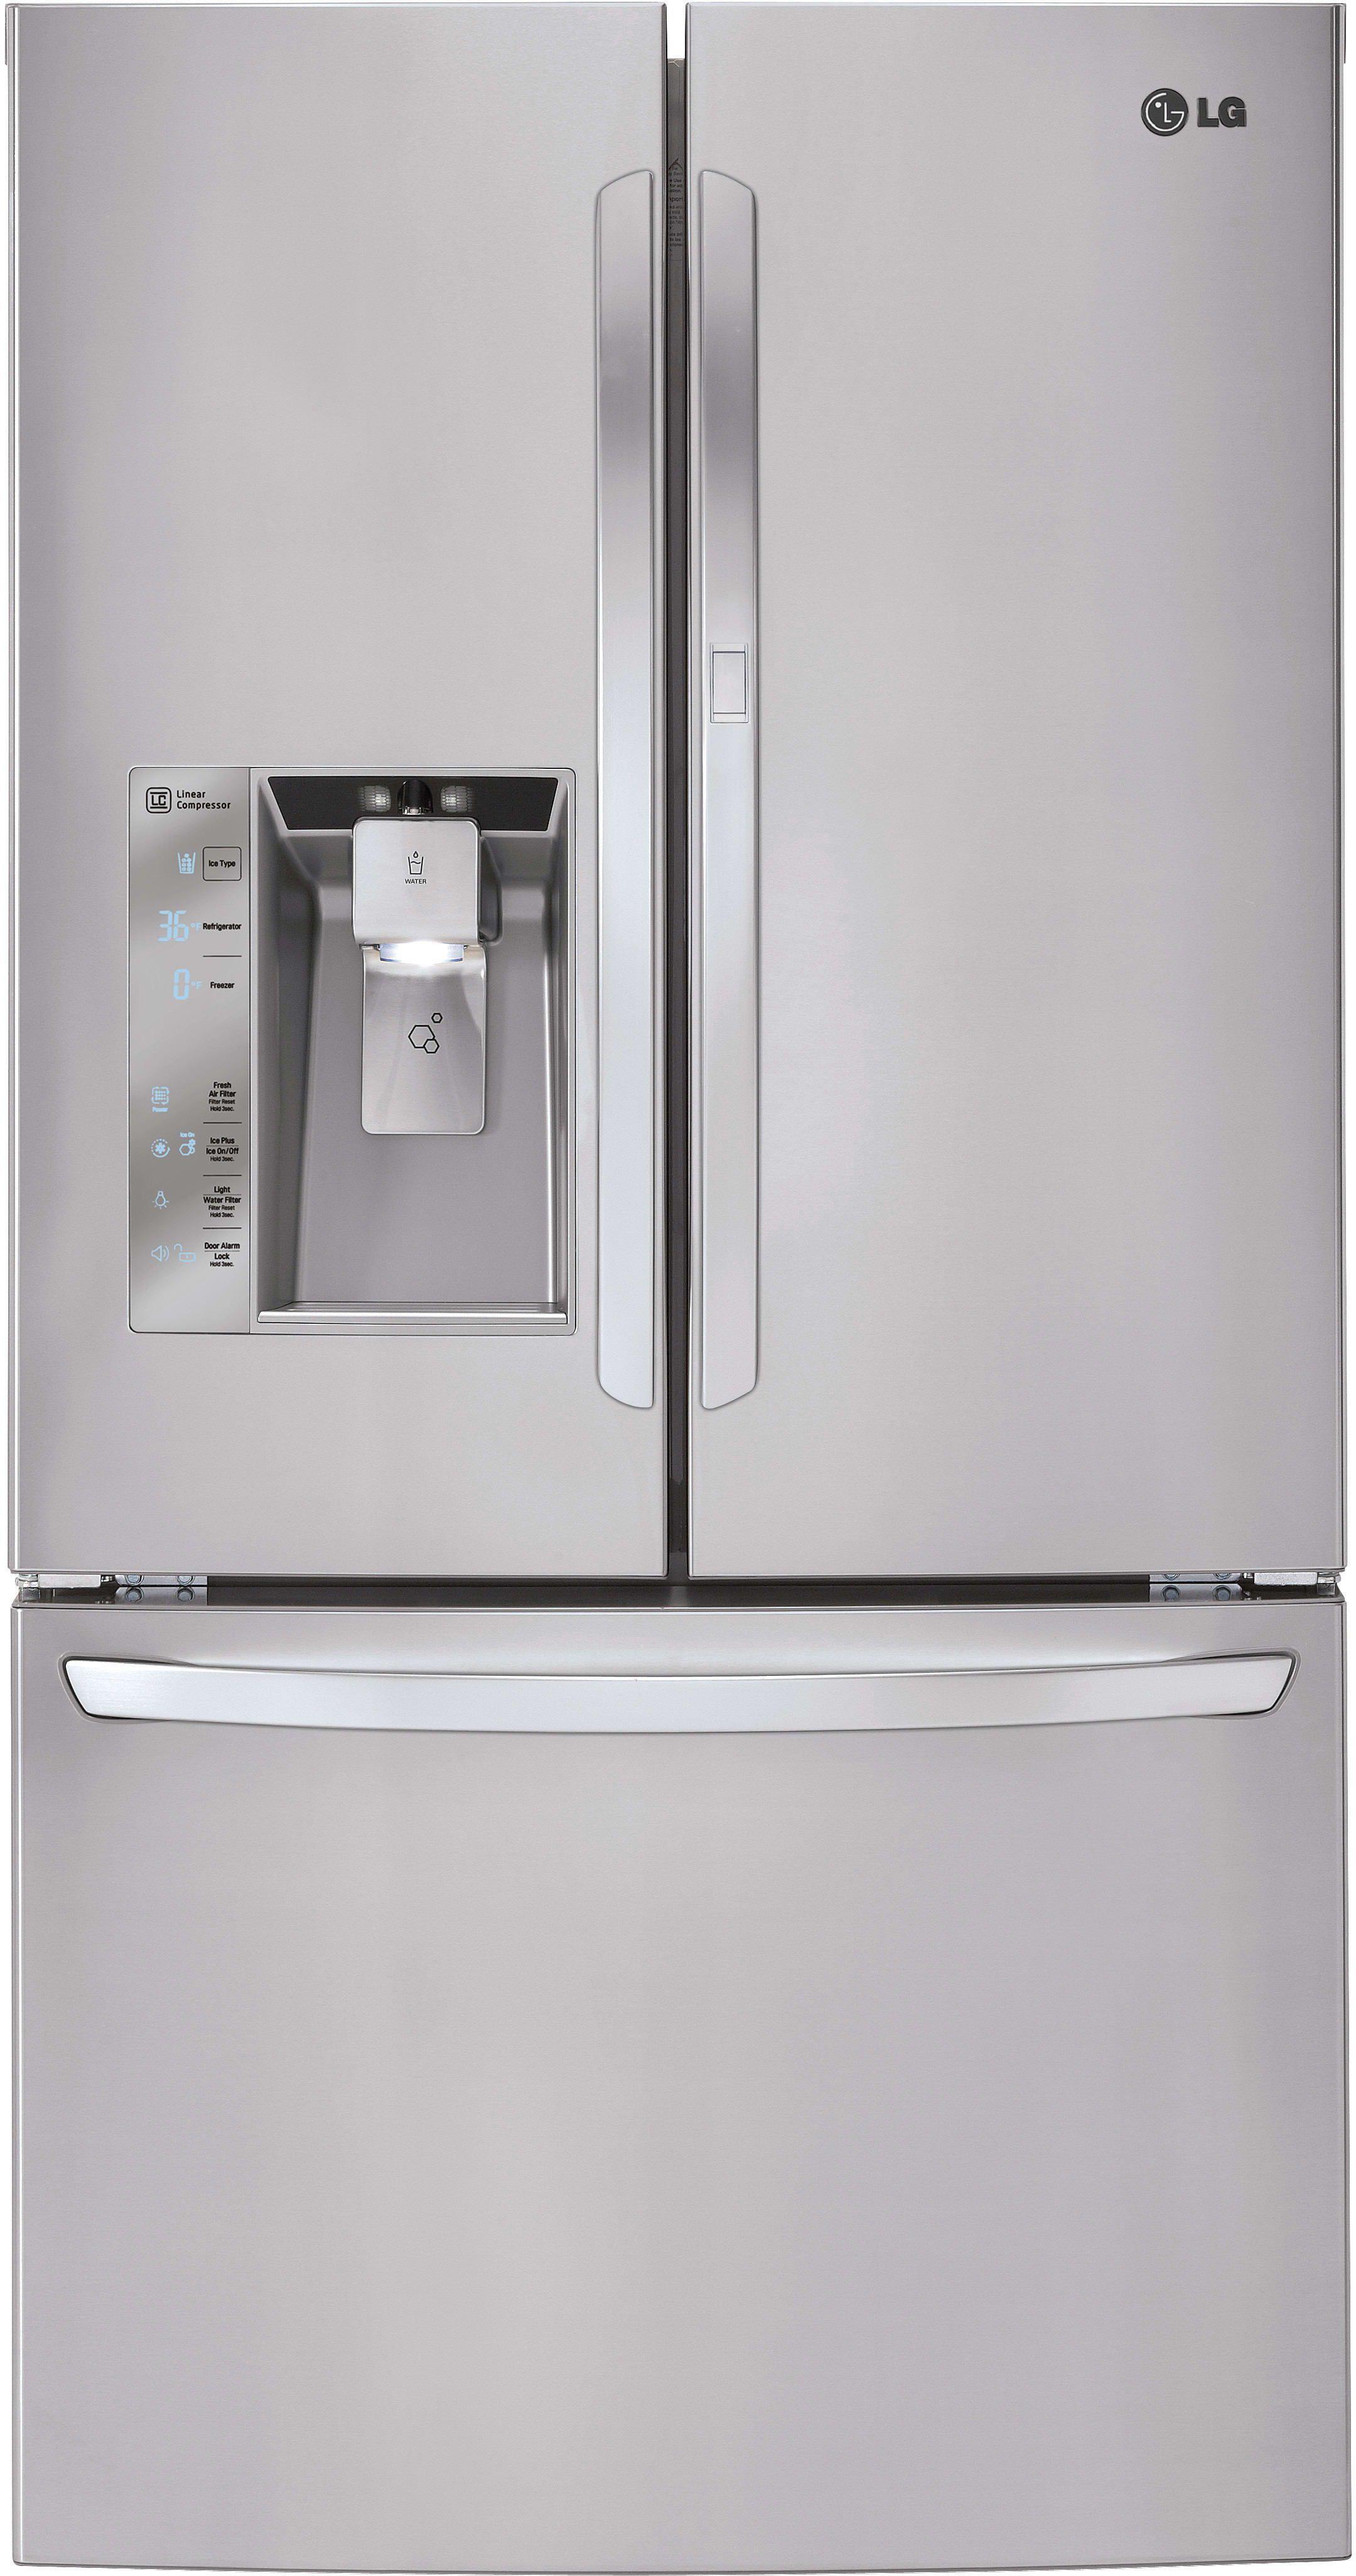 44+ Lg fridge with craft ice best buy ideas